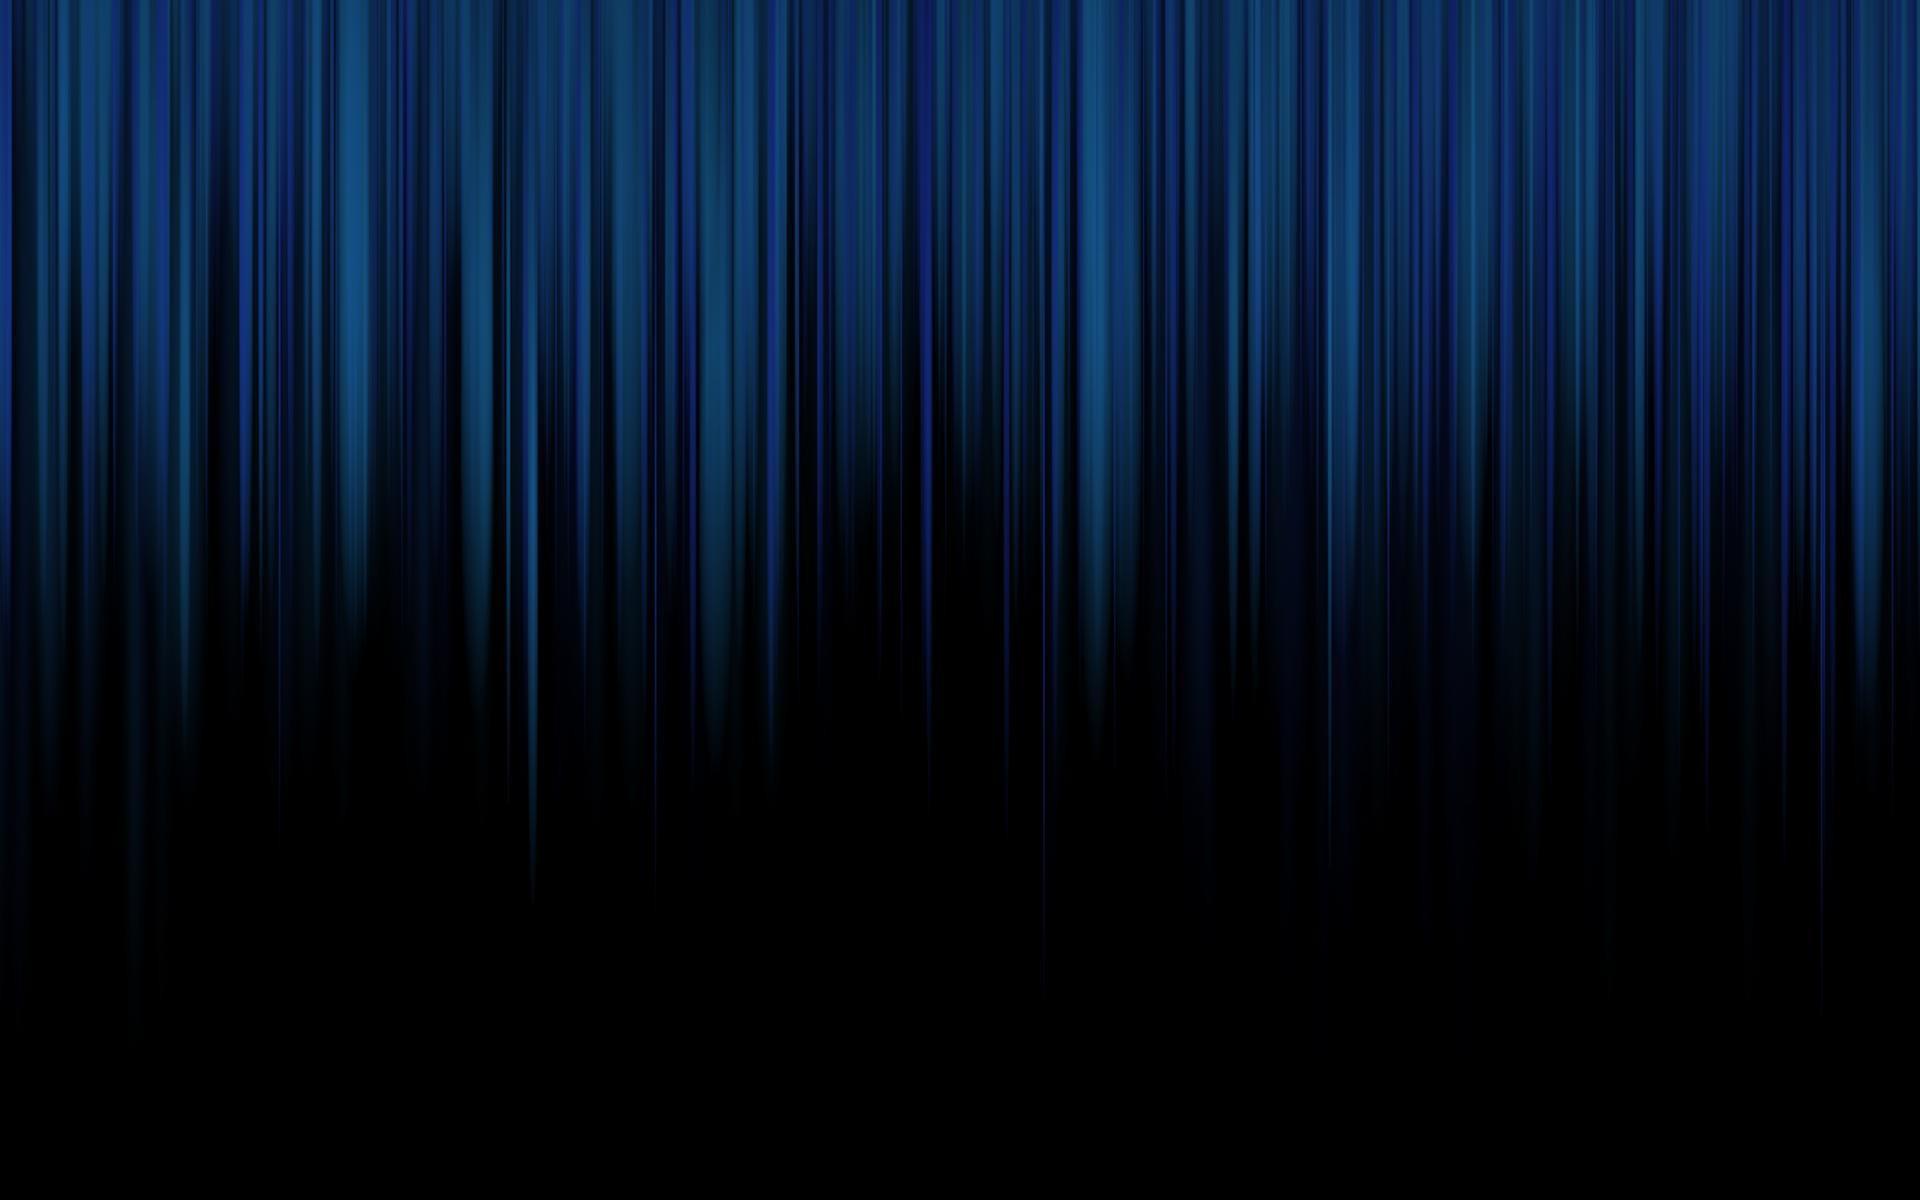 Free-Dark-Blue-Wallpaper-High-Quality-download